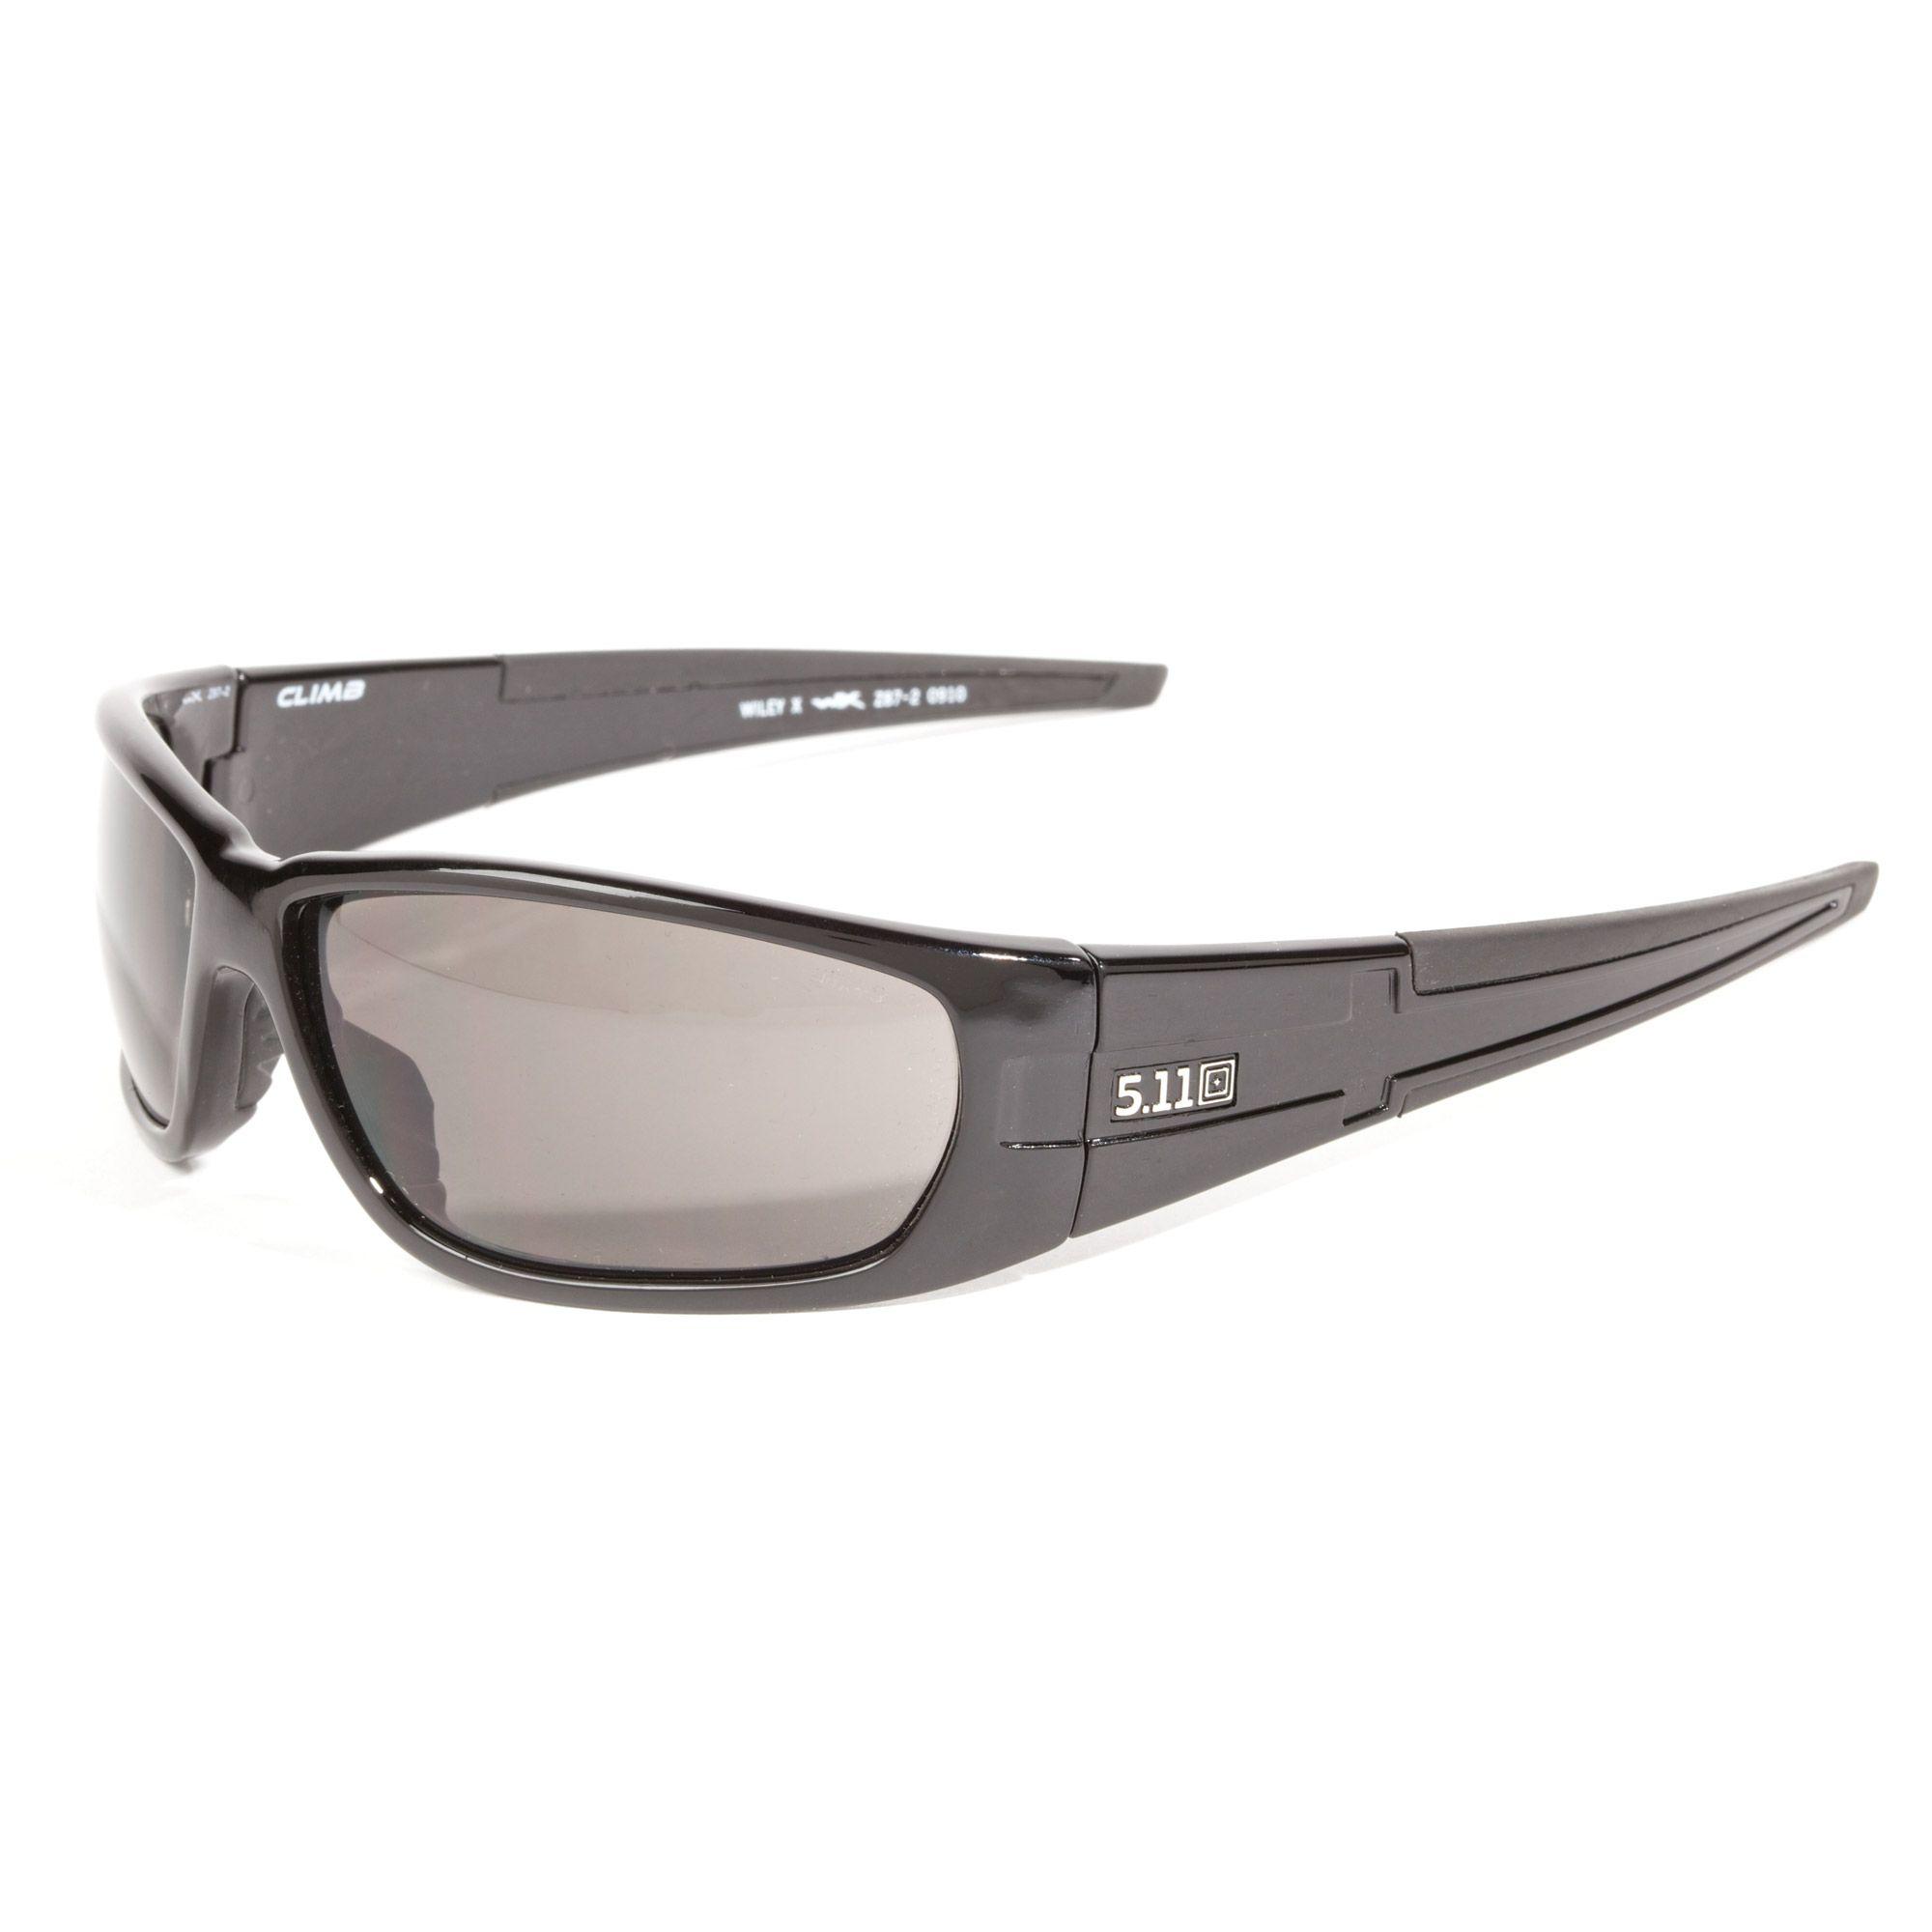 5.11 Climb Polarized sunglasses(Ballistic) Sunglasses